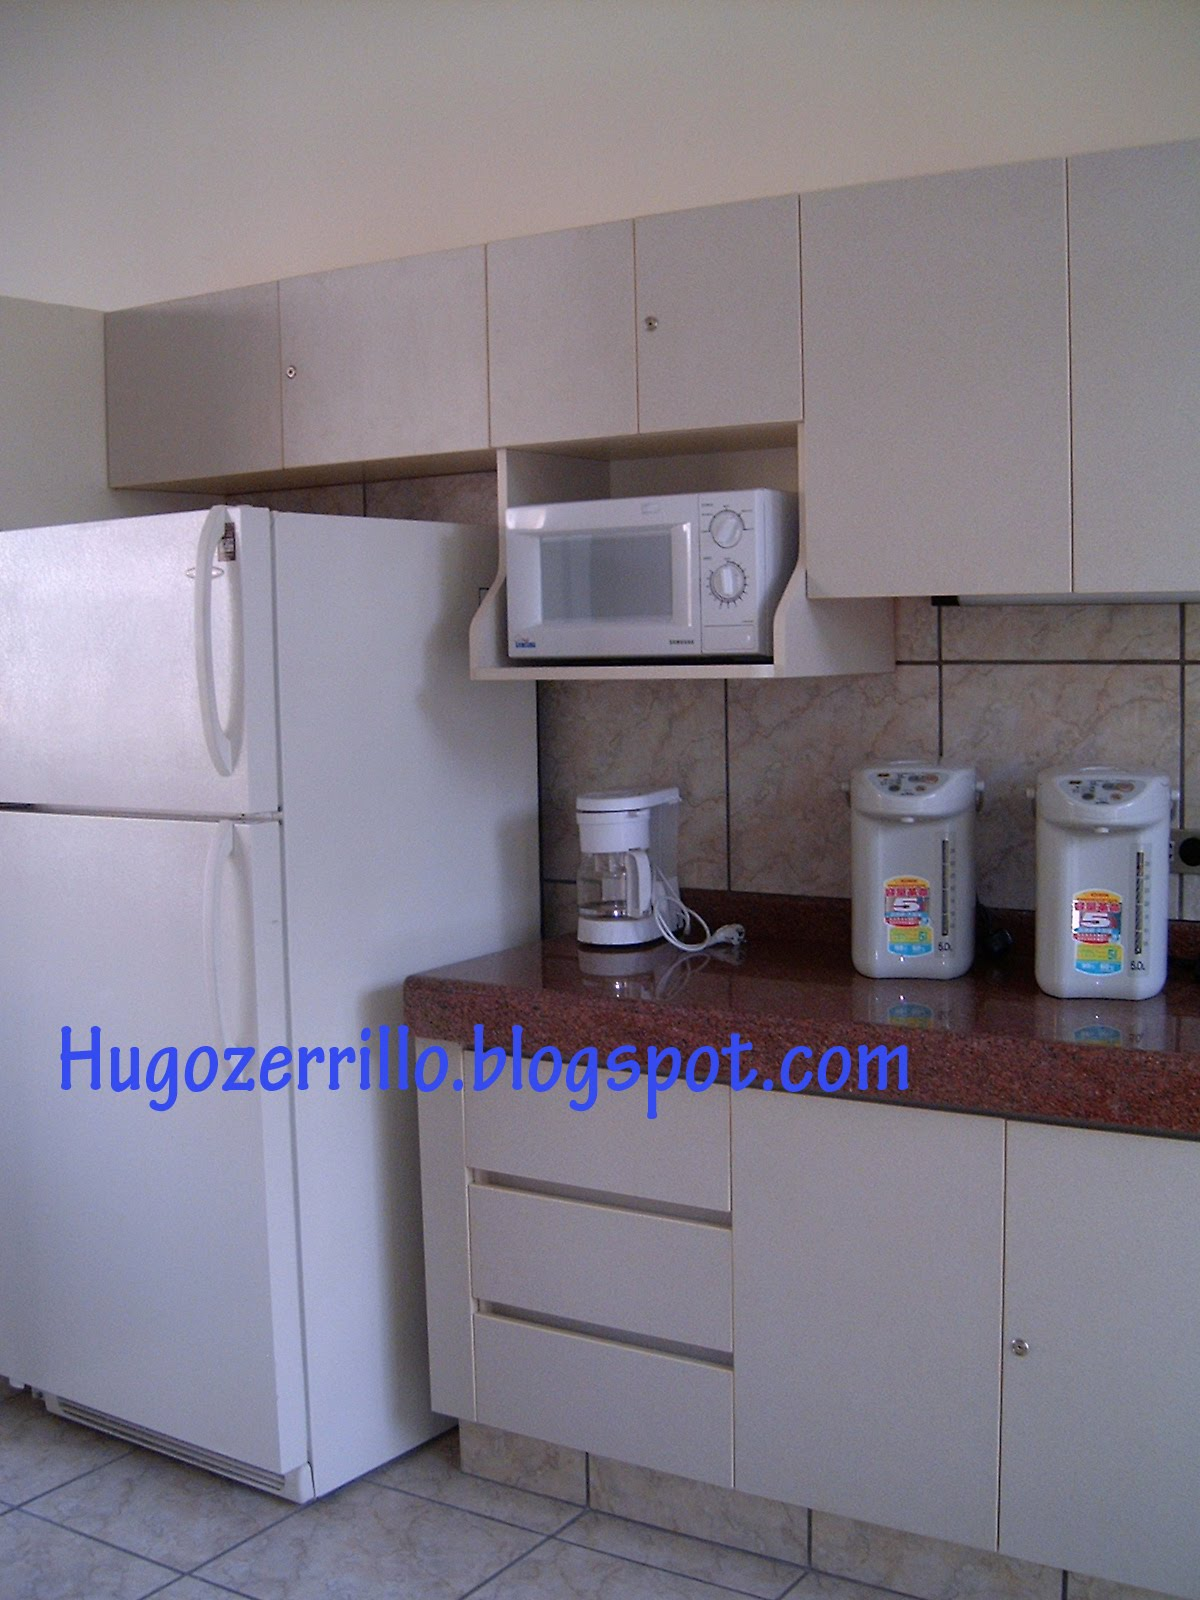 Cocinas empotradas en concreto peque as imagui for Modelos de cocinas empotradas en cemento y porcelanato